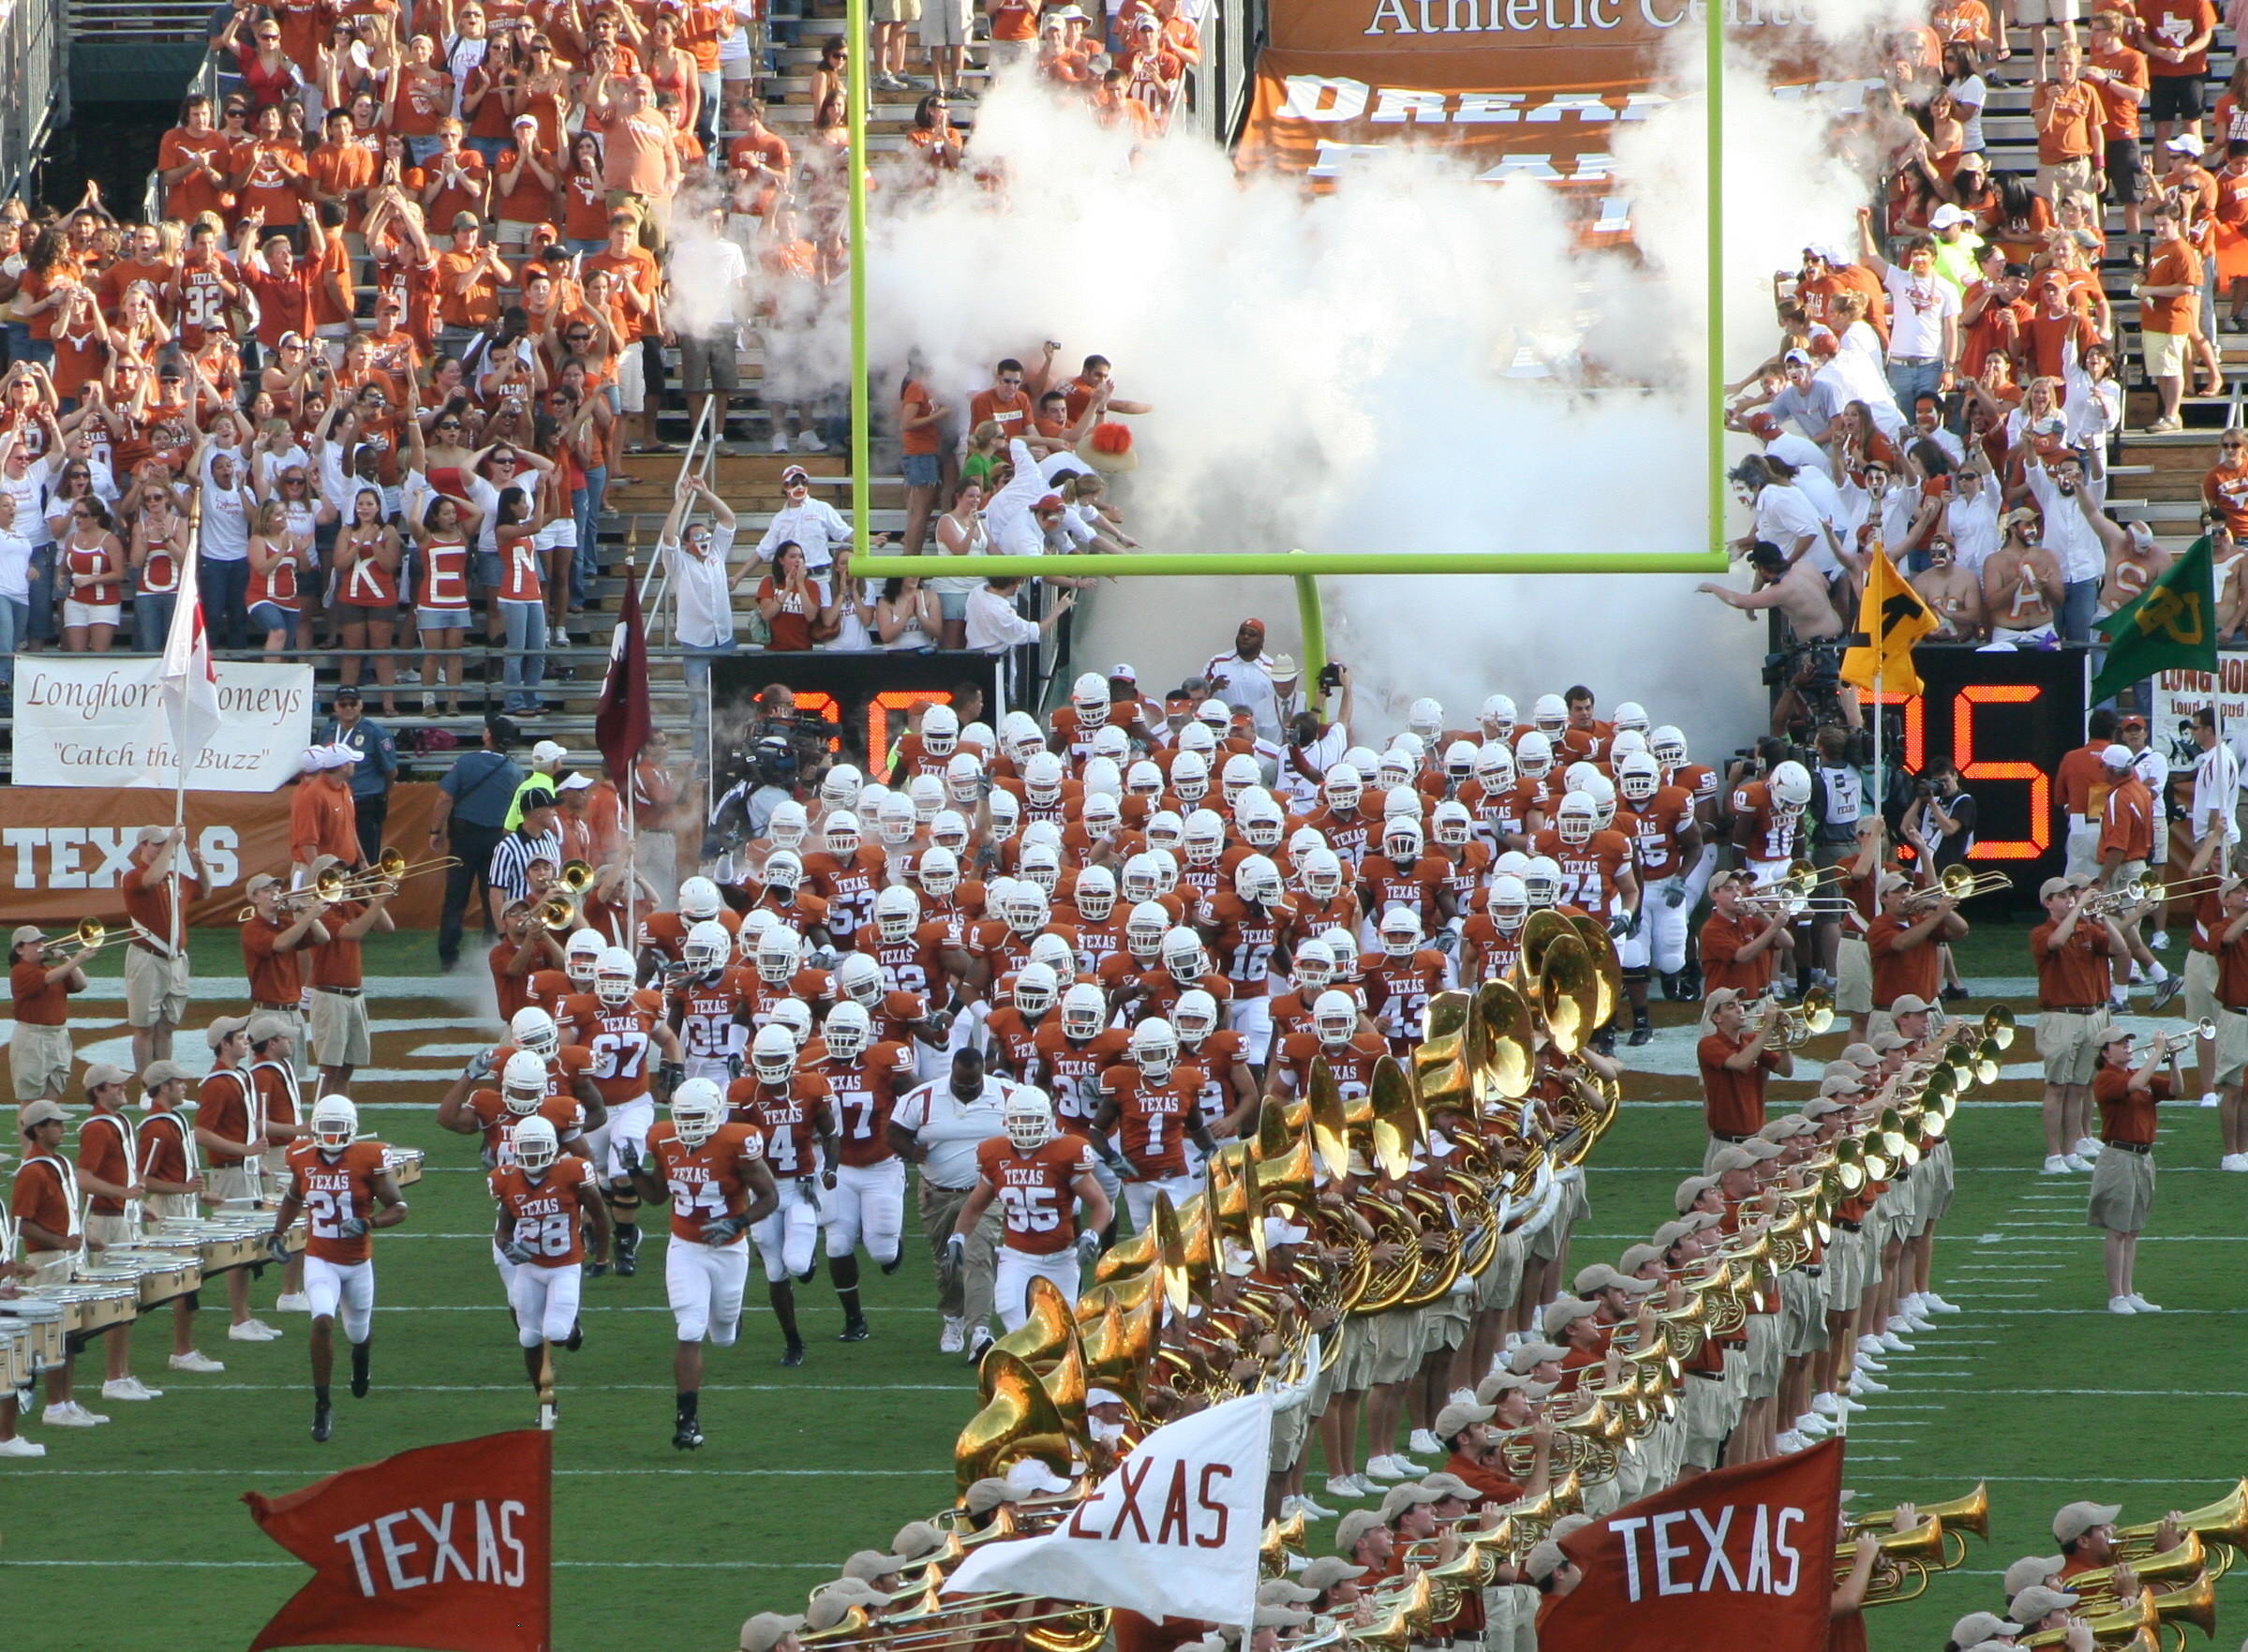 UT Longhorns Merchandise – Buy Texas Longhorns Football Gear!